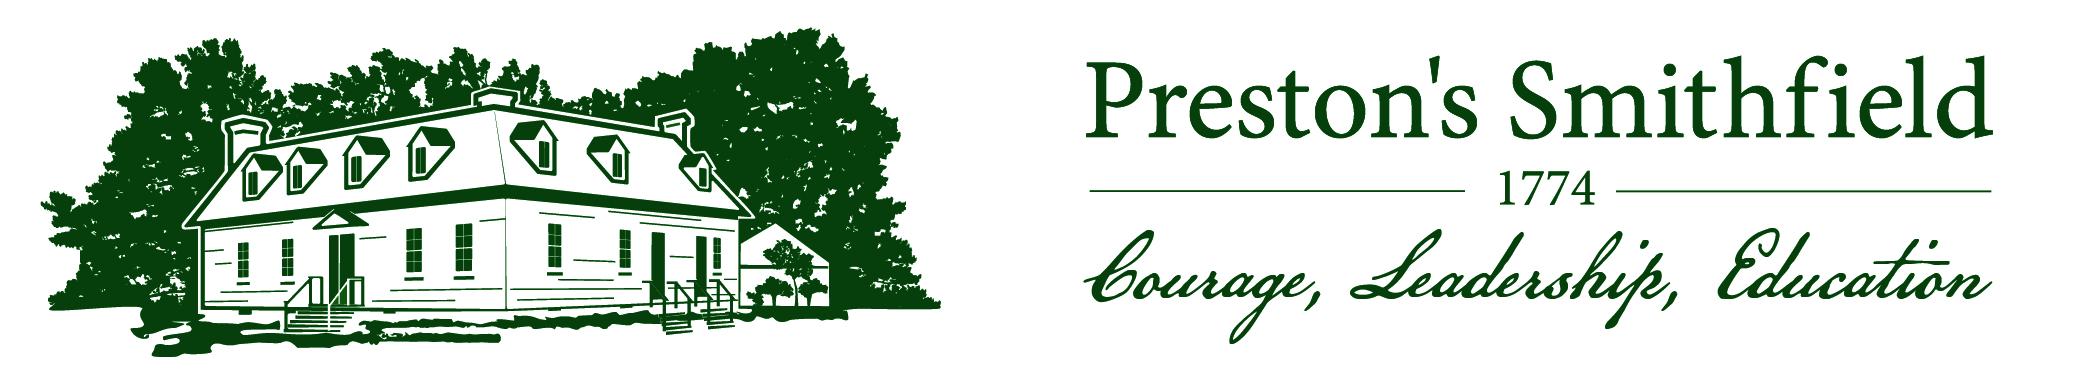 Historic Smithfield logo